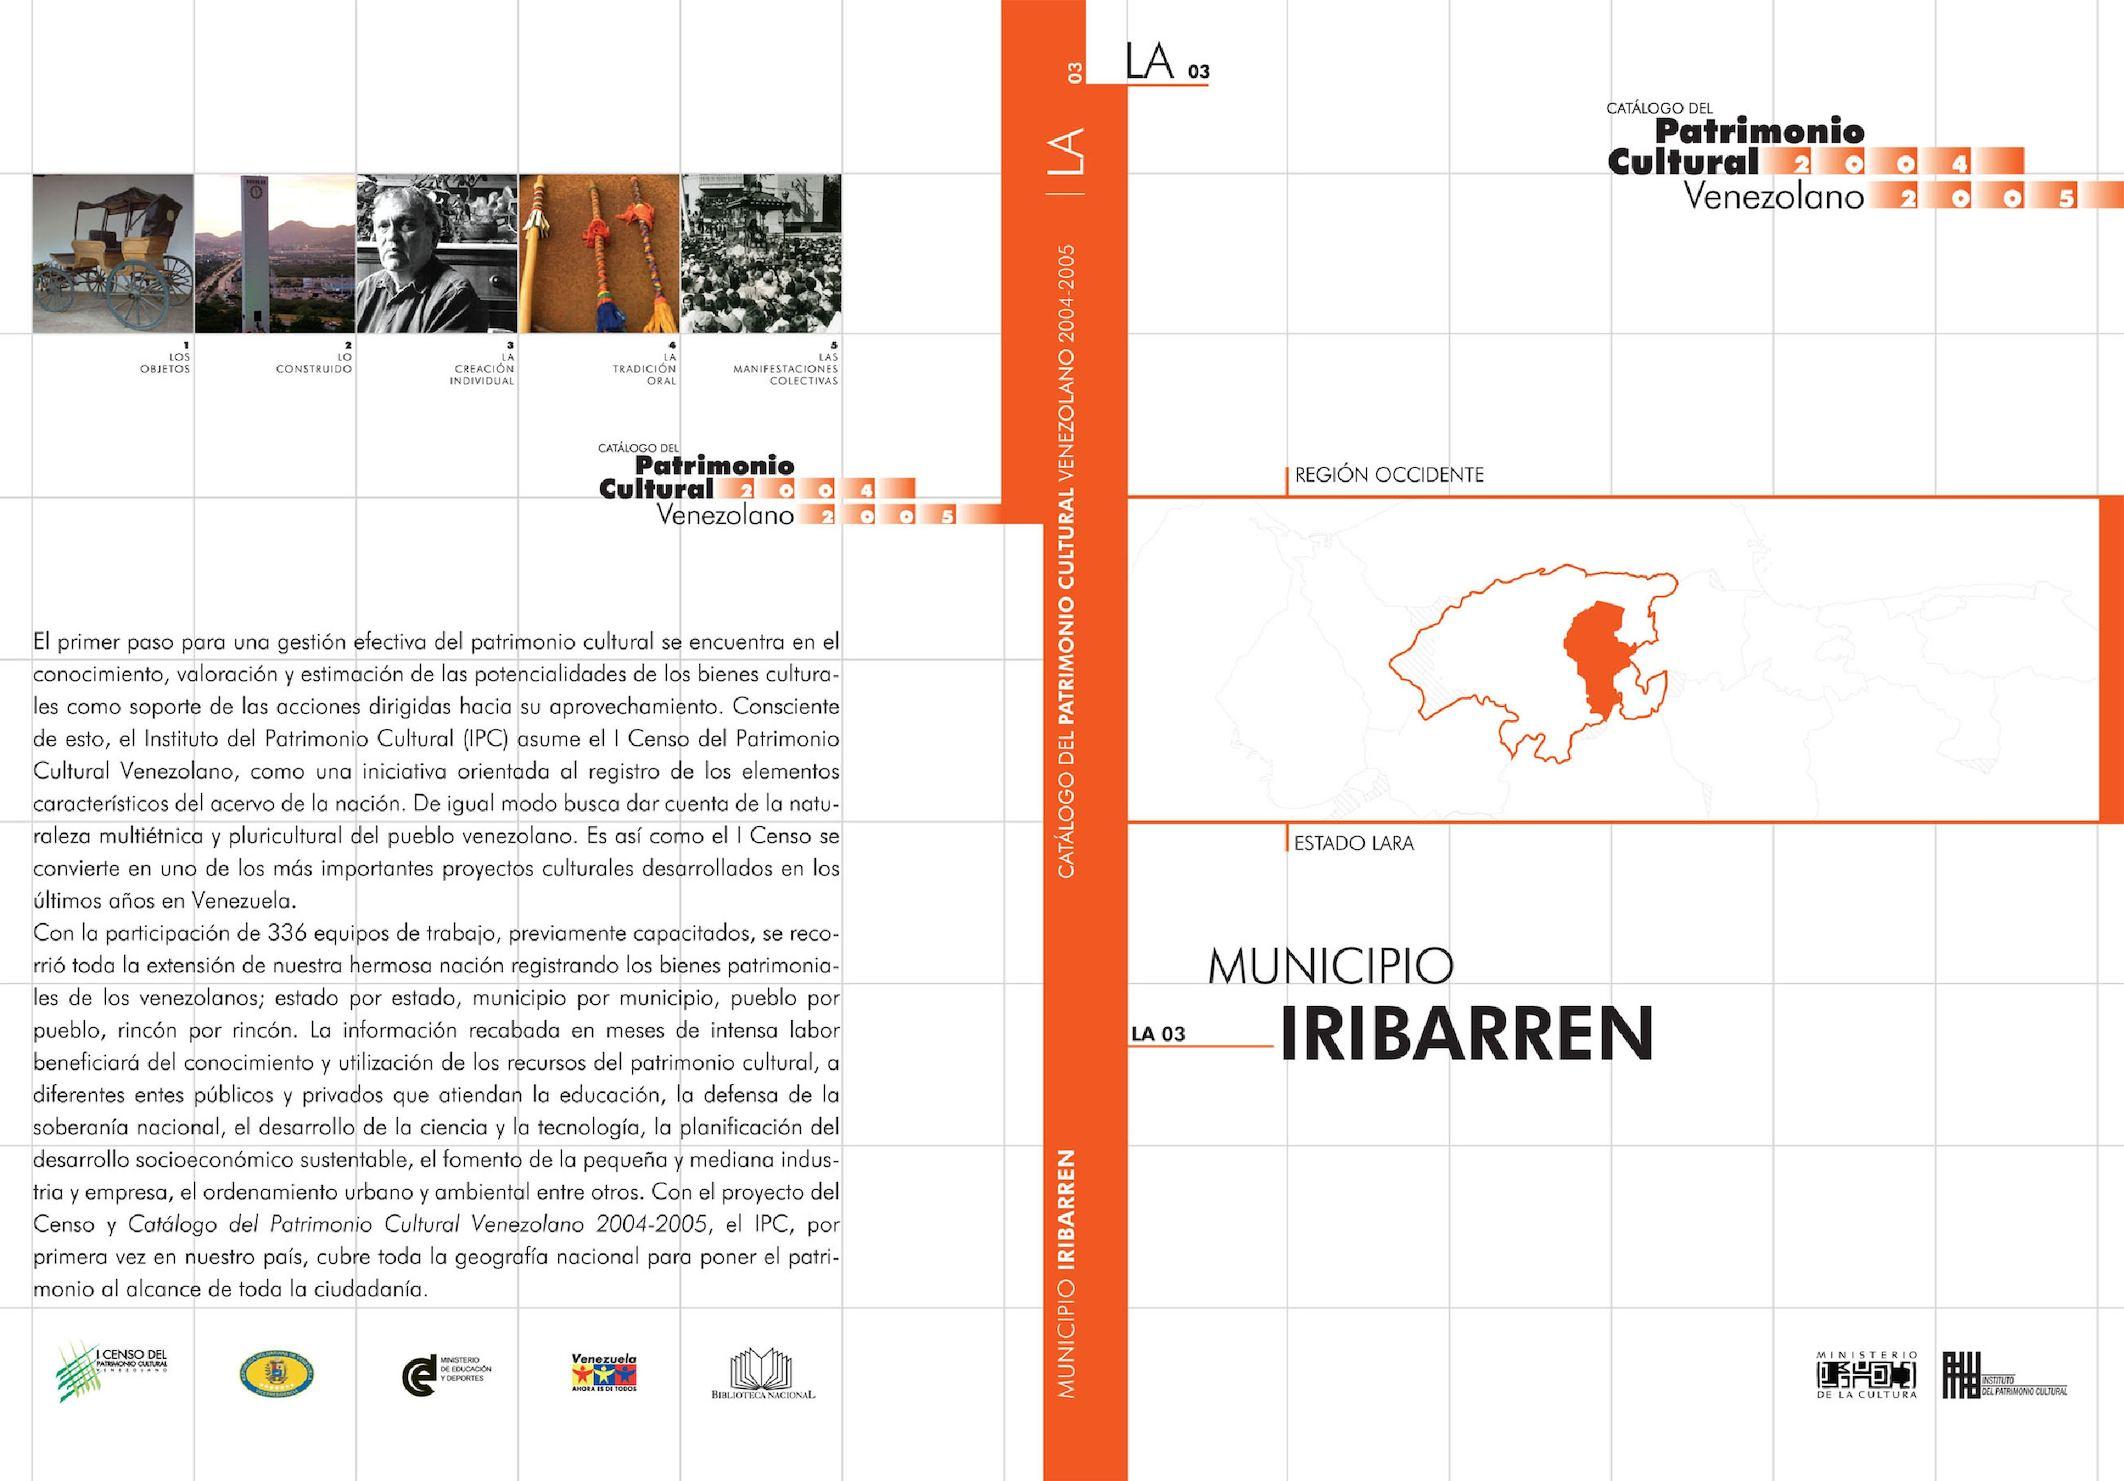 50bea4e4a Calaméo - Catalogo del Patrimonio Cultural Municipio Iribarren (Lara- Barquisimeto) Venezuela